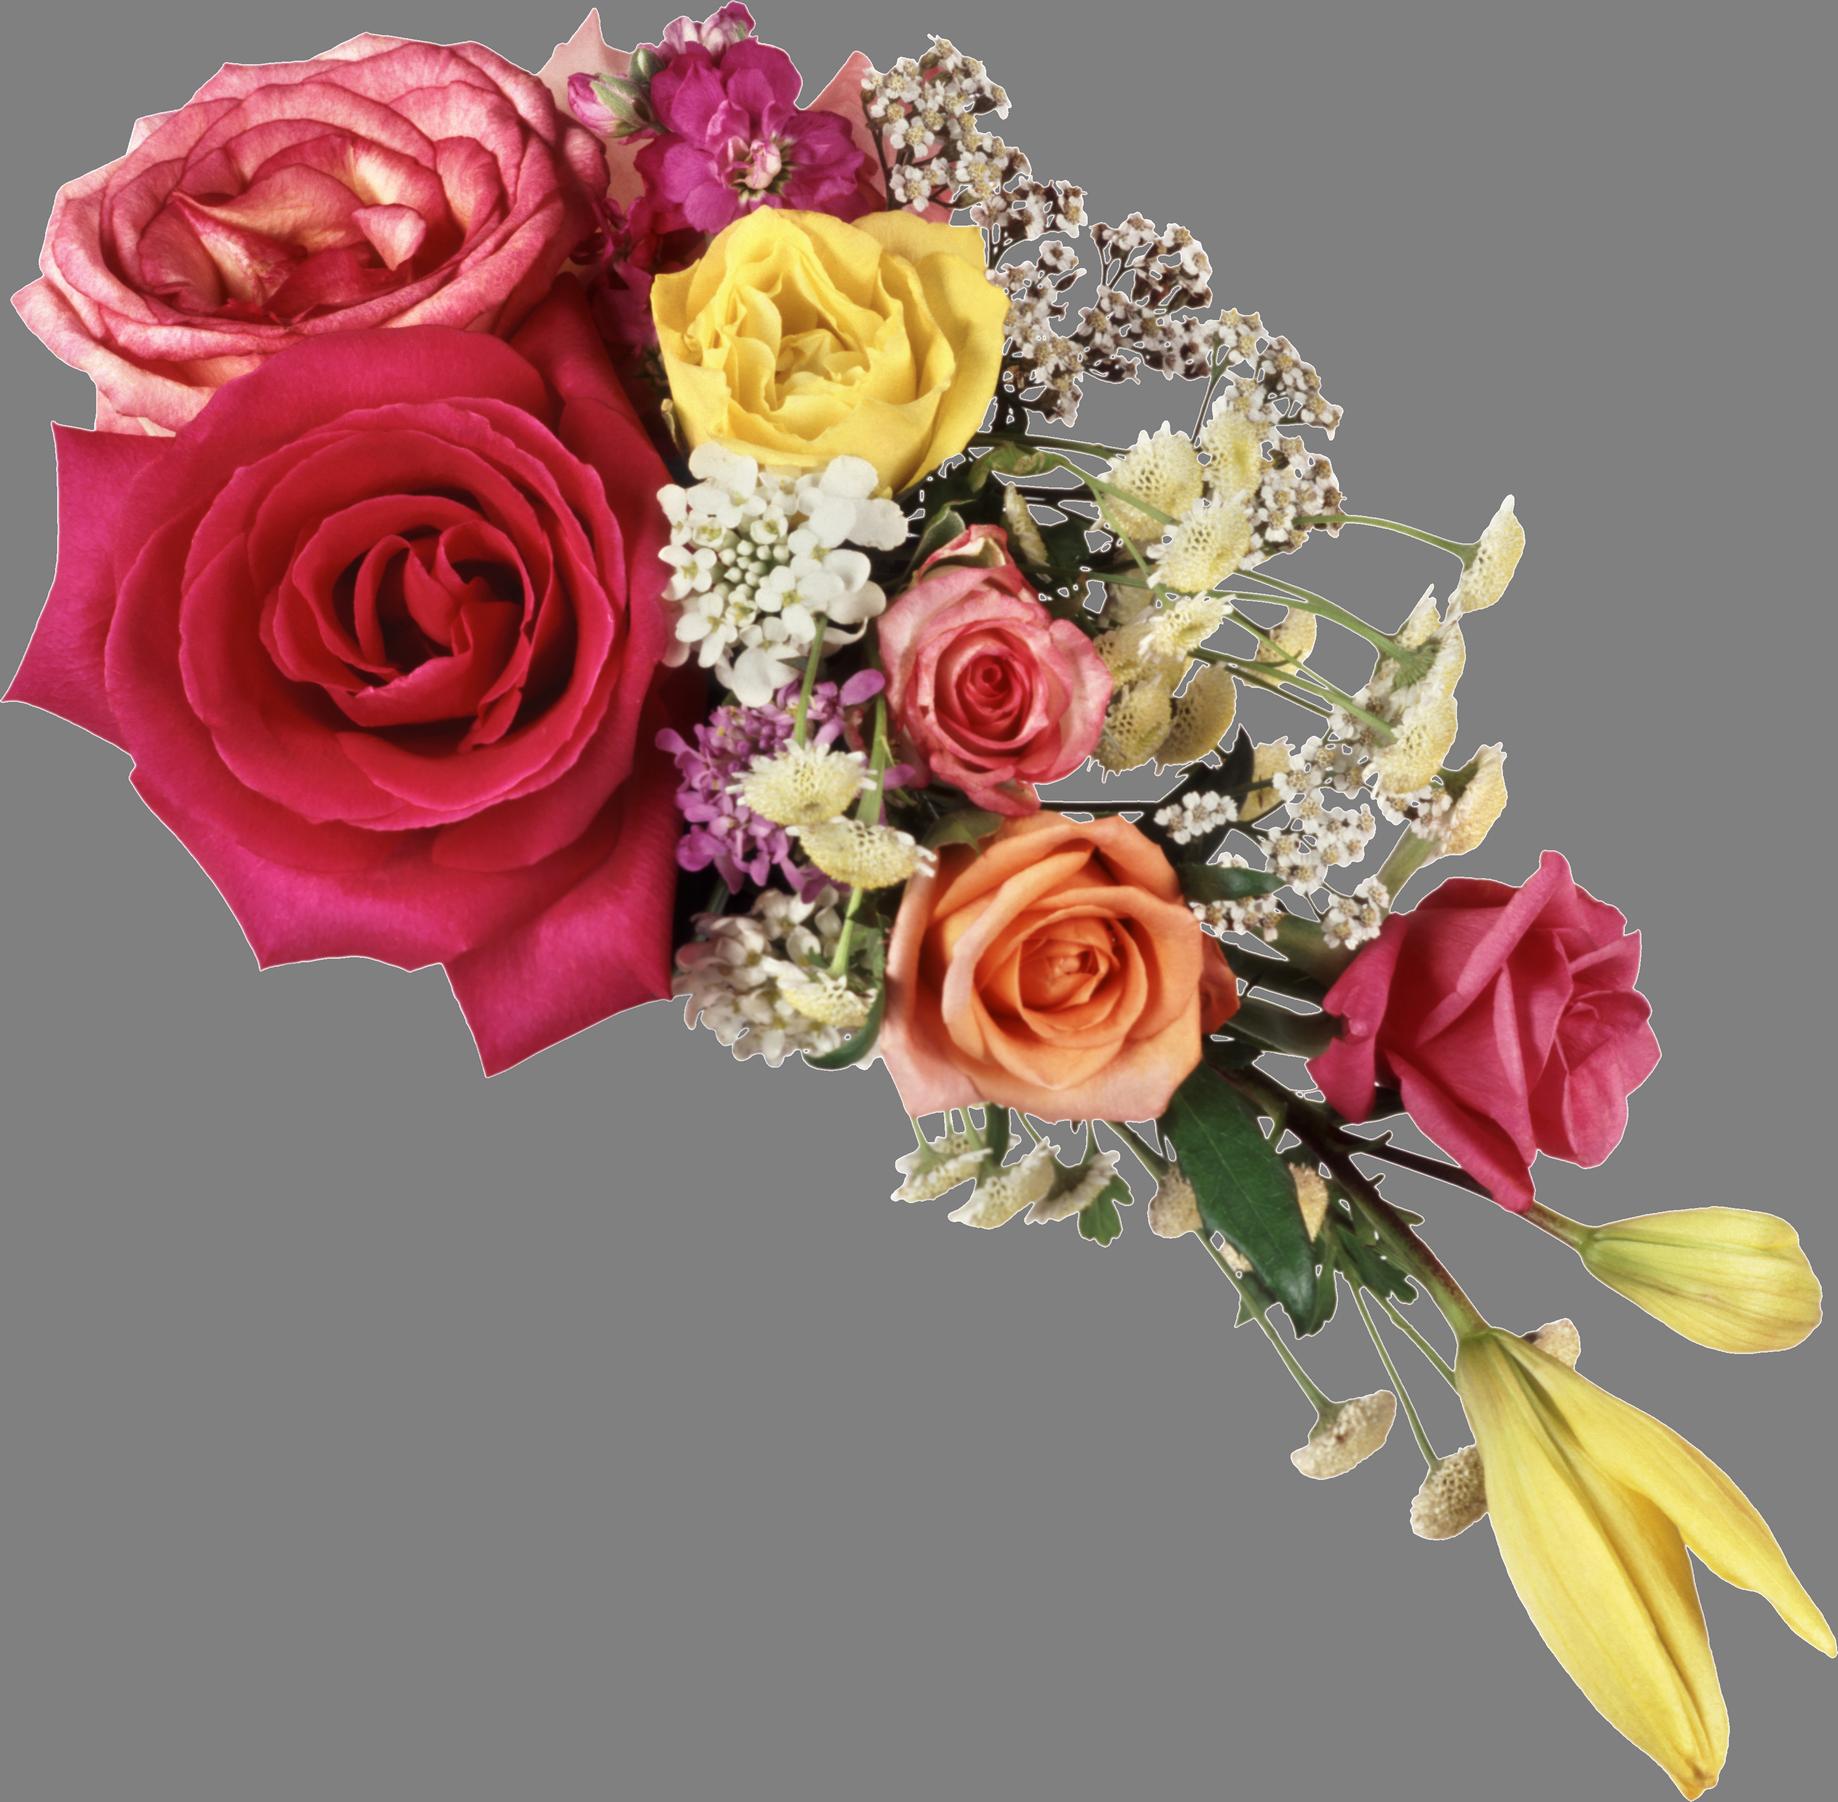 Bouquet Of Flowers Flowers Bouquet Expensive Flowers Flowers